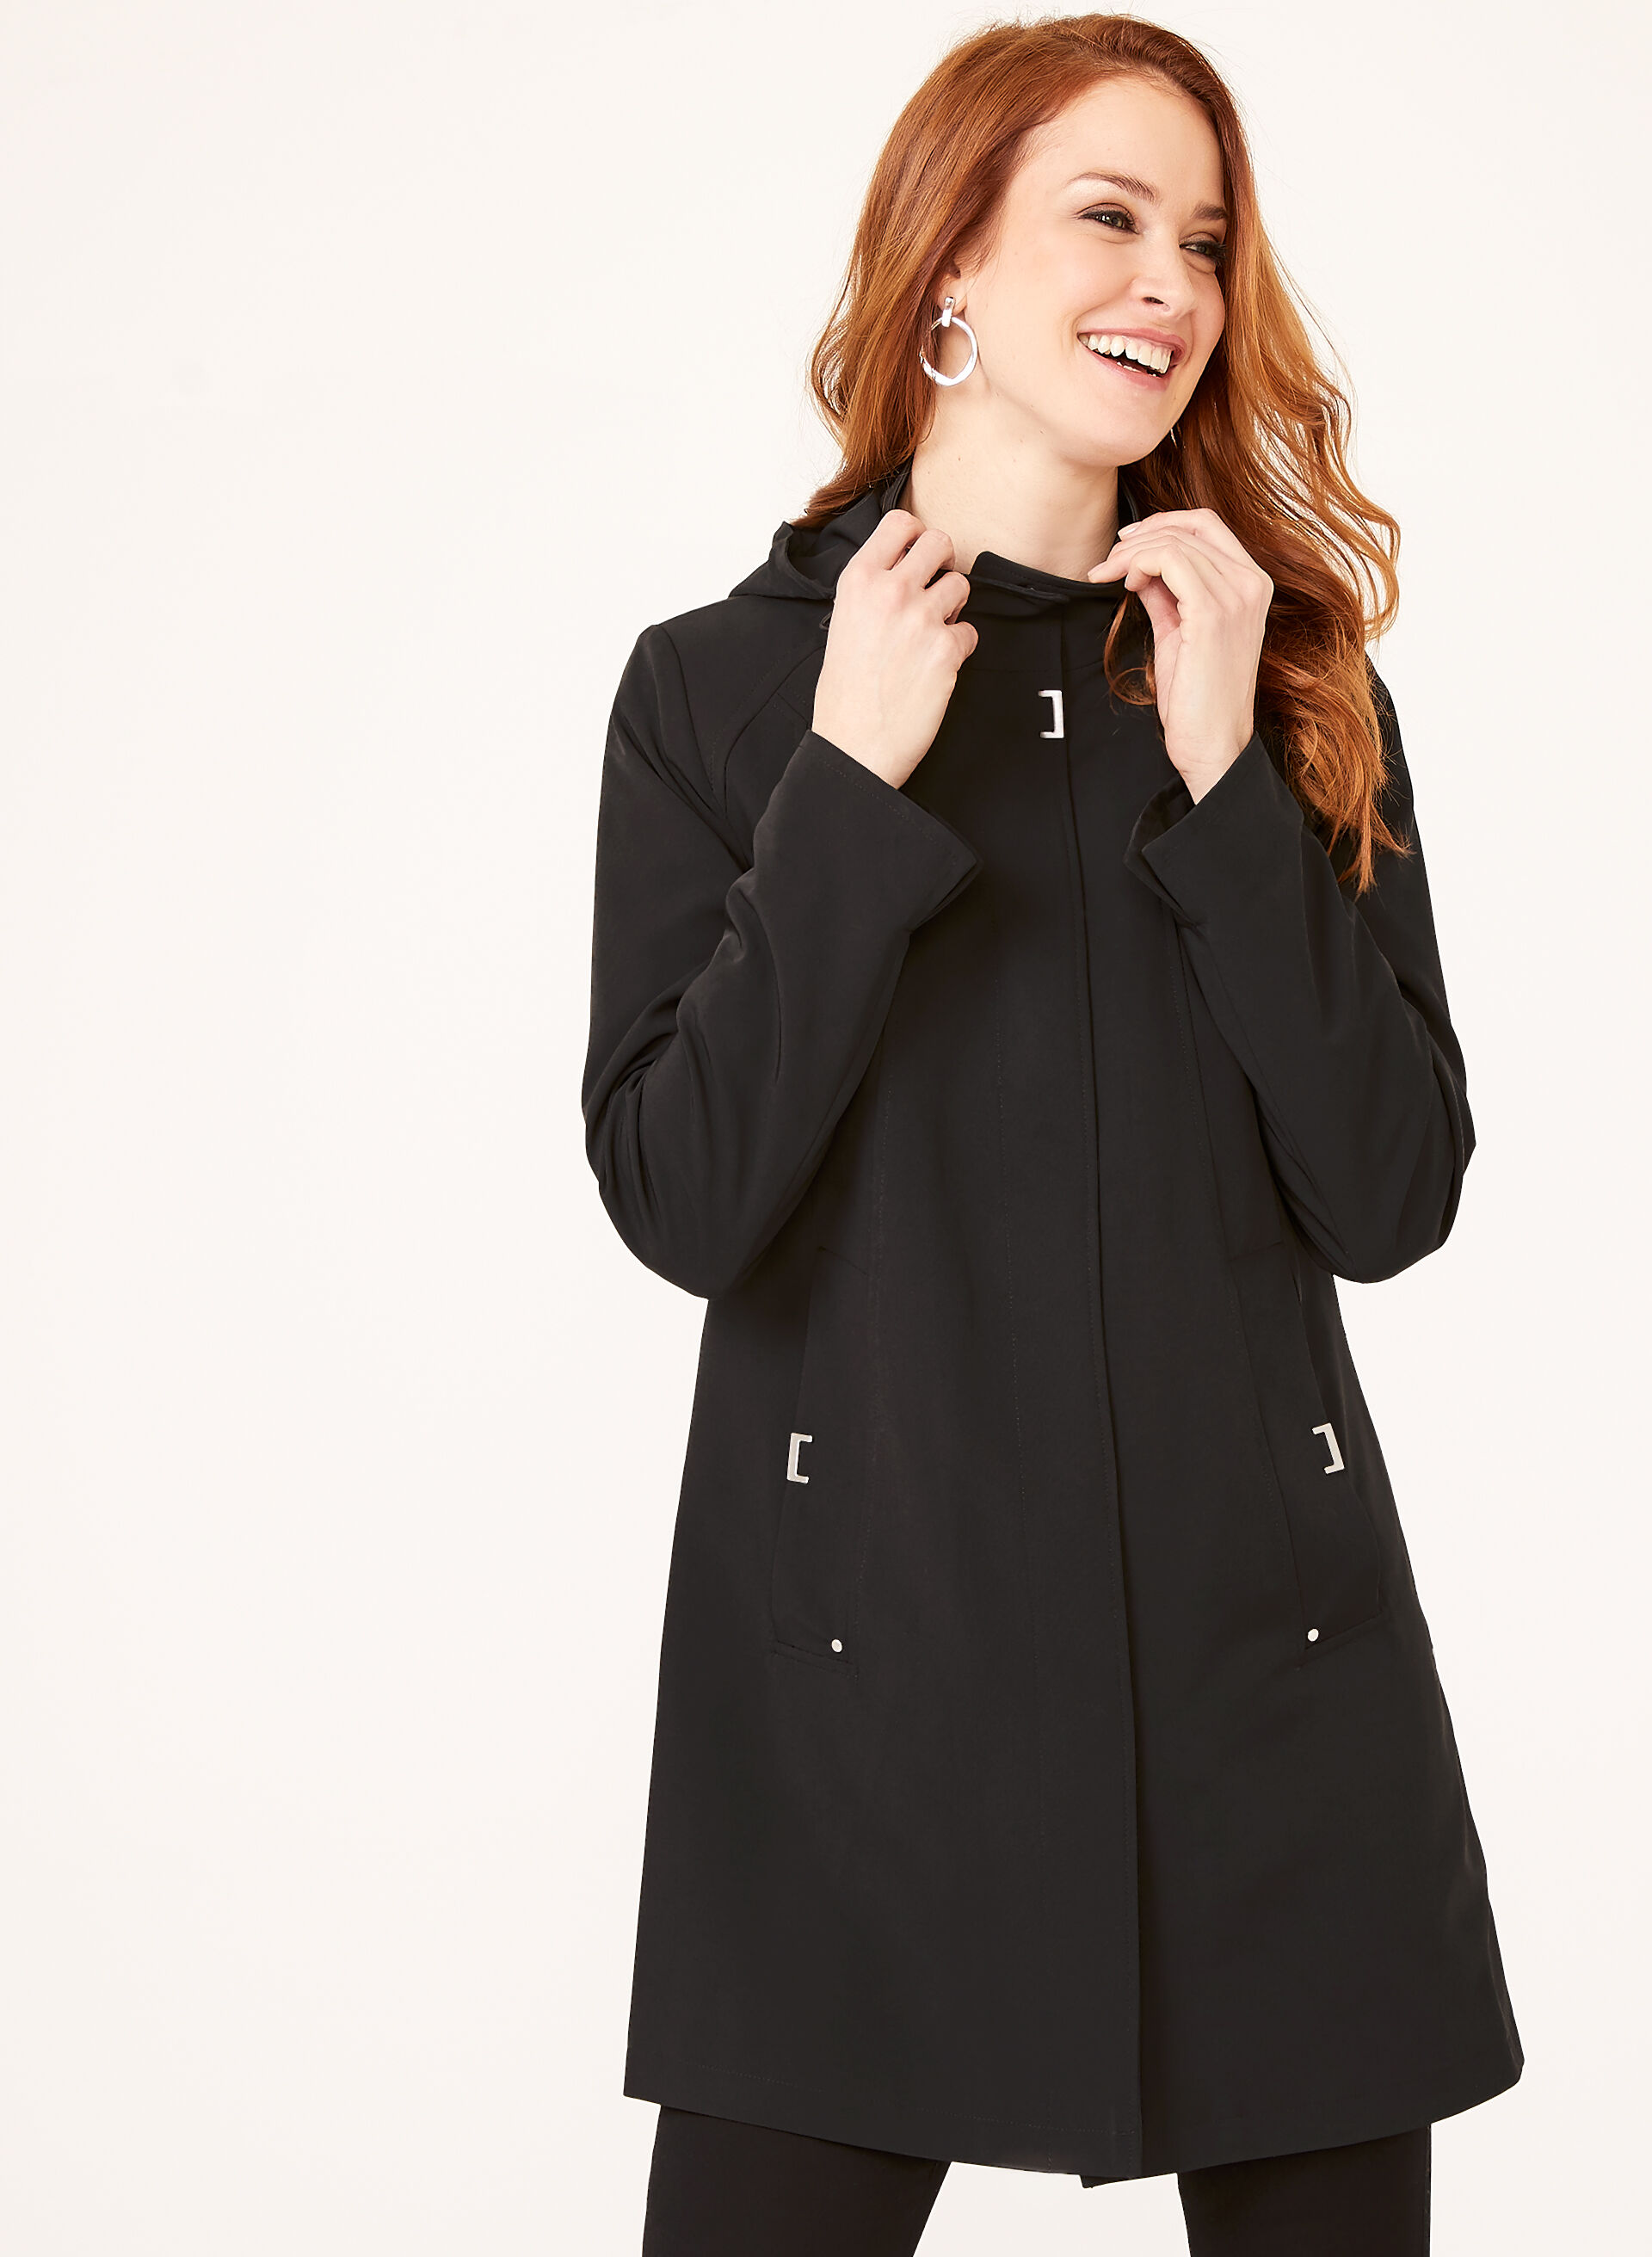 Manteau de printemps femme canada